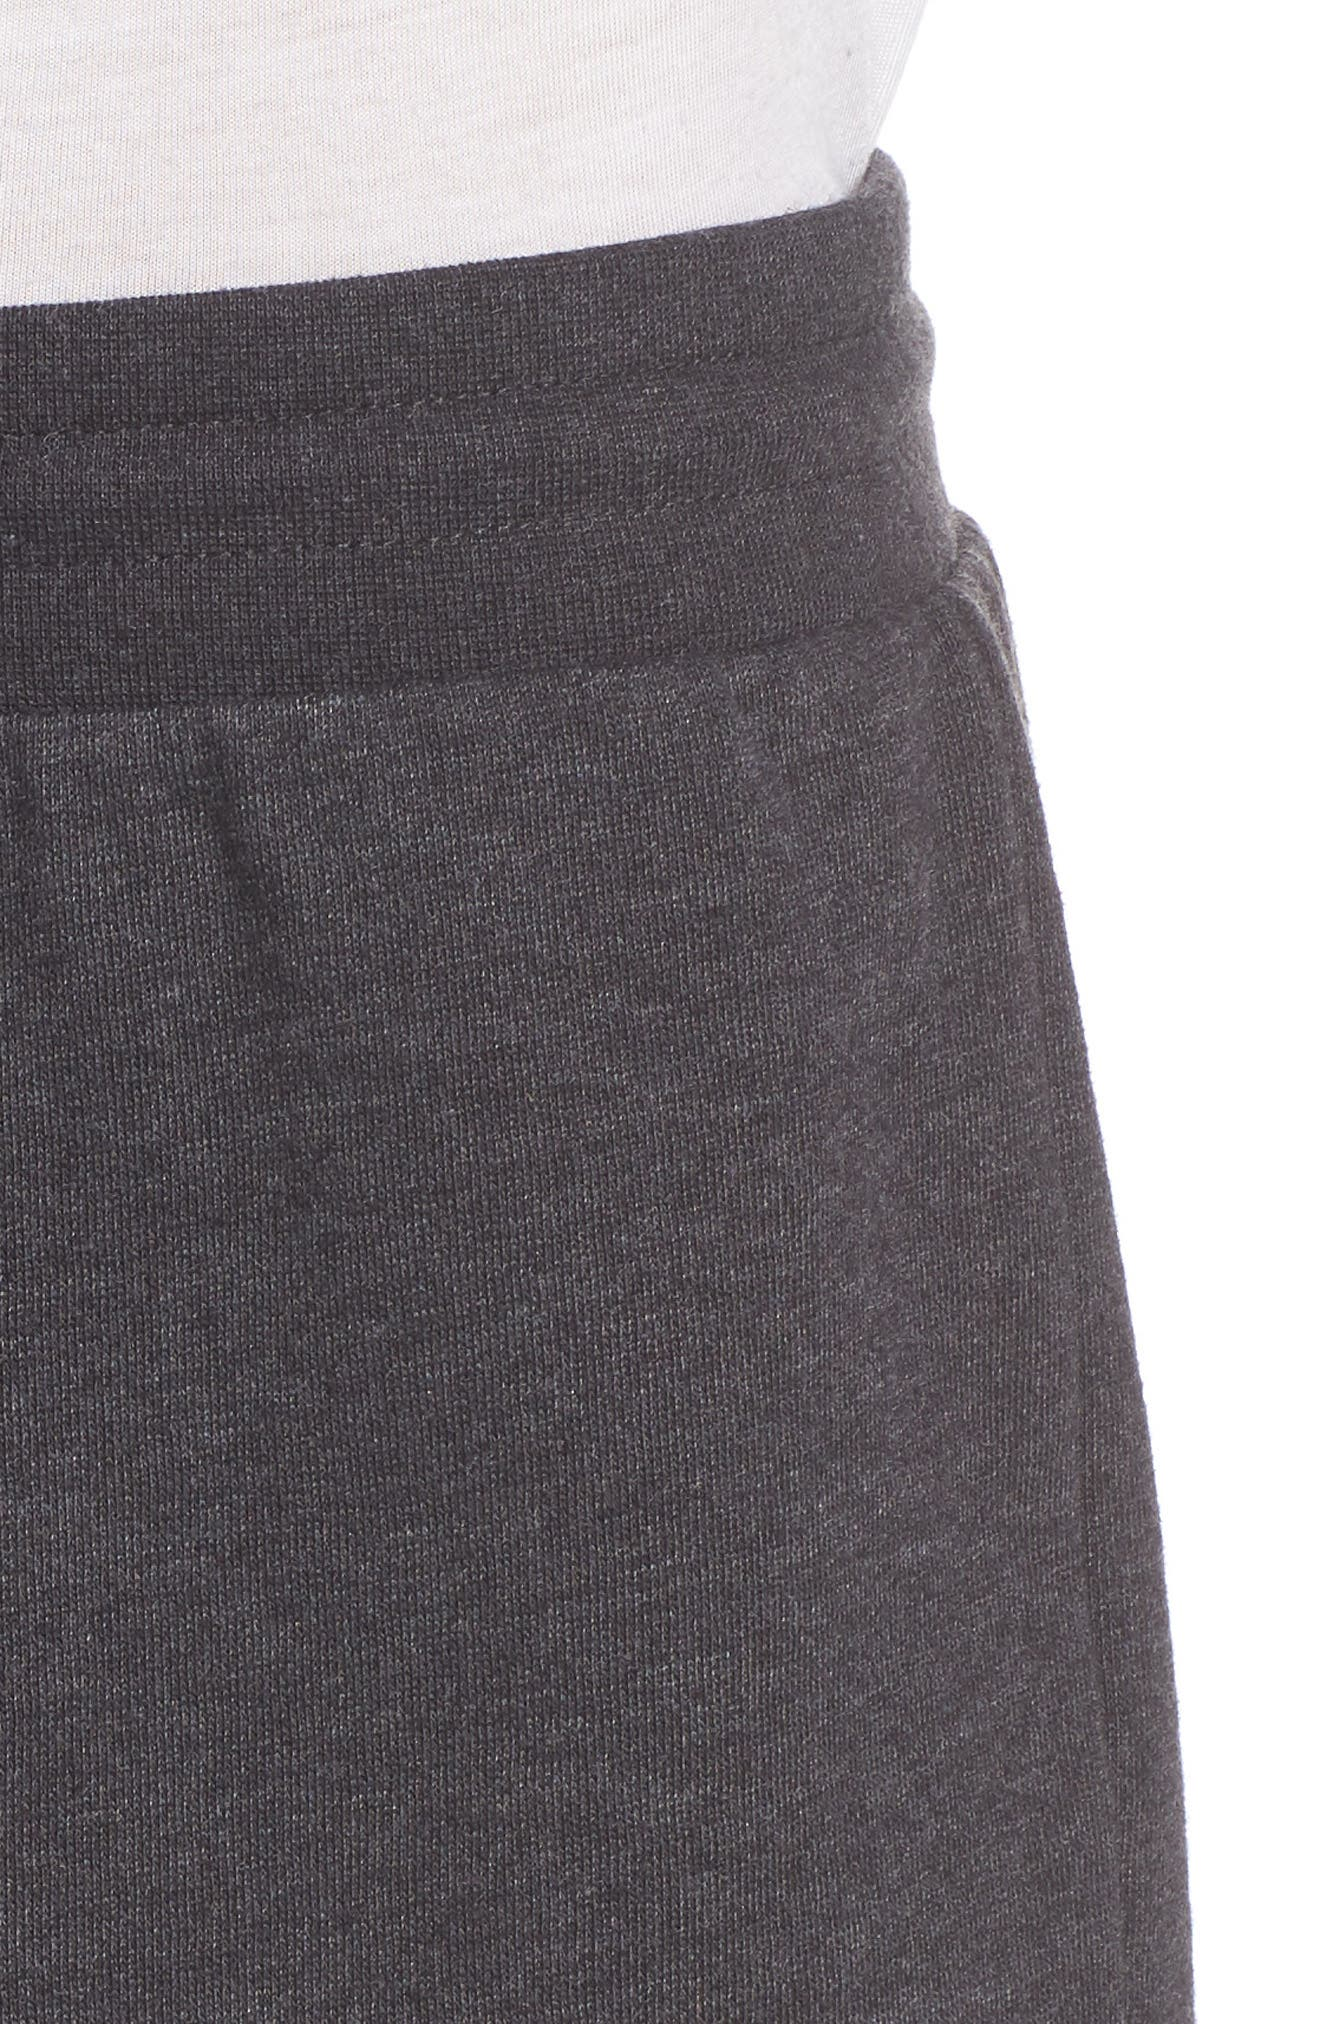 Easy Lounge Shorts,                             Alternate thumbnail 4, color,                             GREY PHANTOM